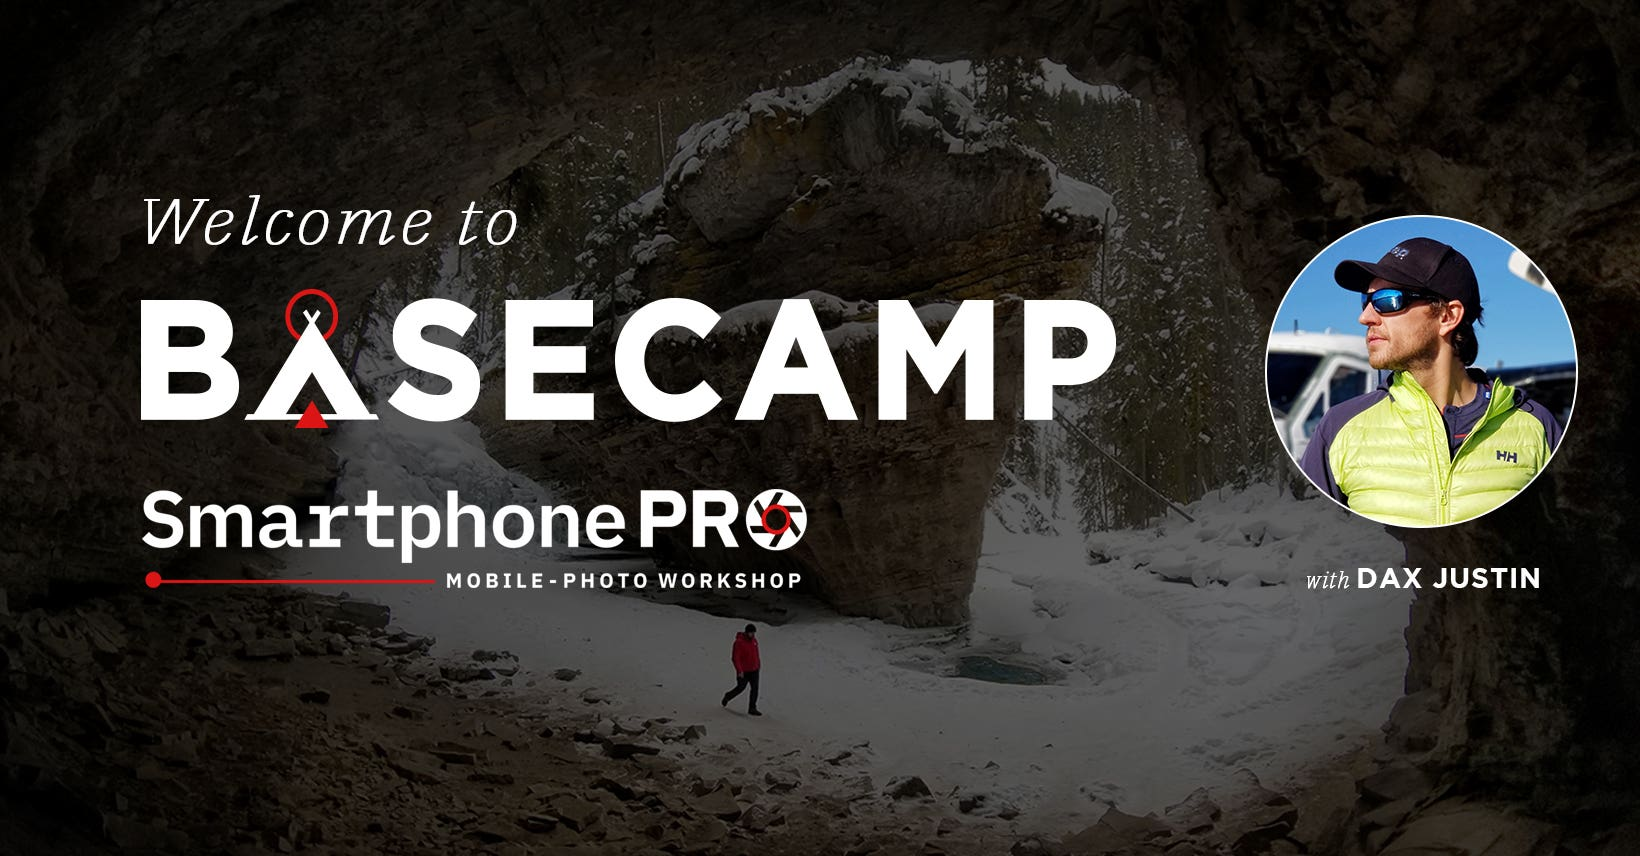 BONUS: LIFETIME access to the Smartphone Pro 'BASECAMP' Community